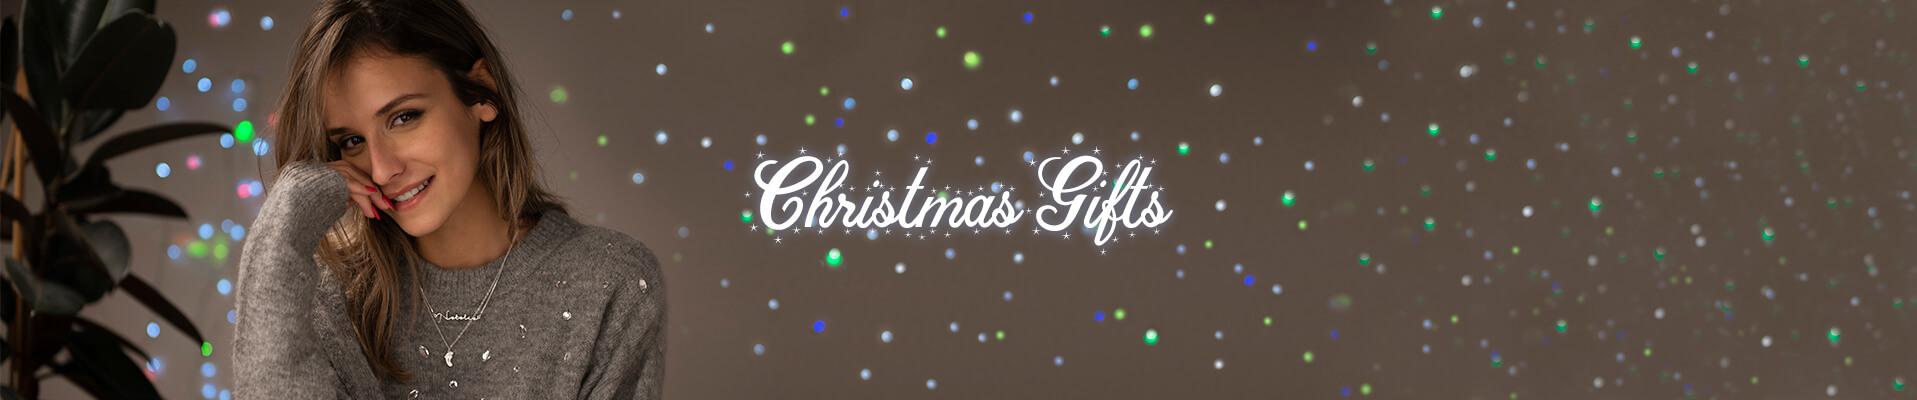 christmas gifts top banner desktop